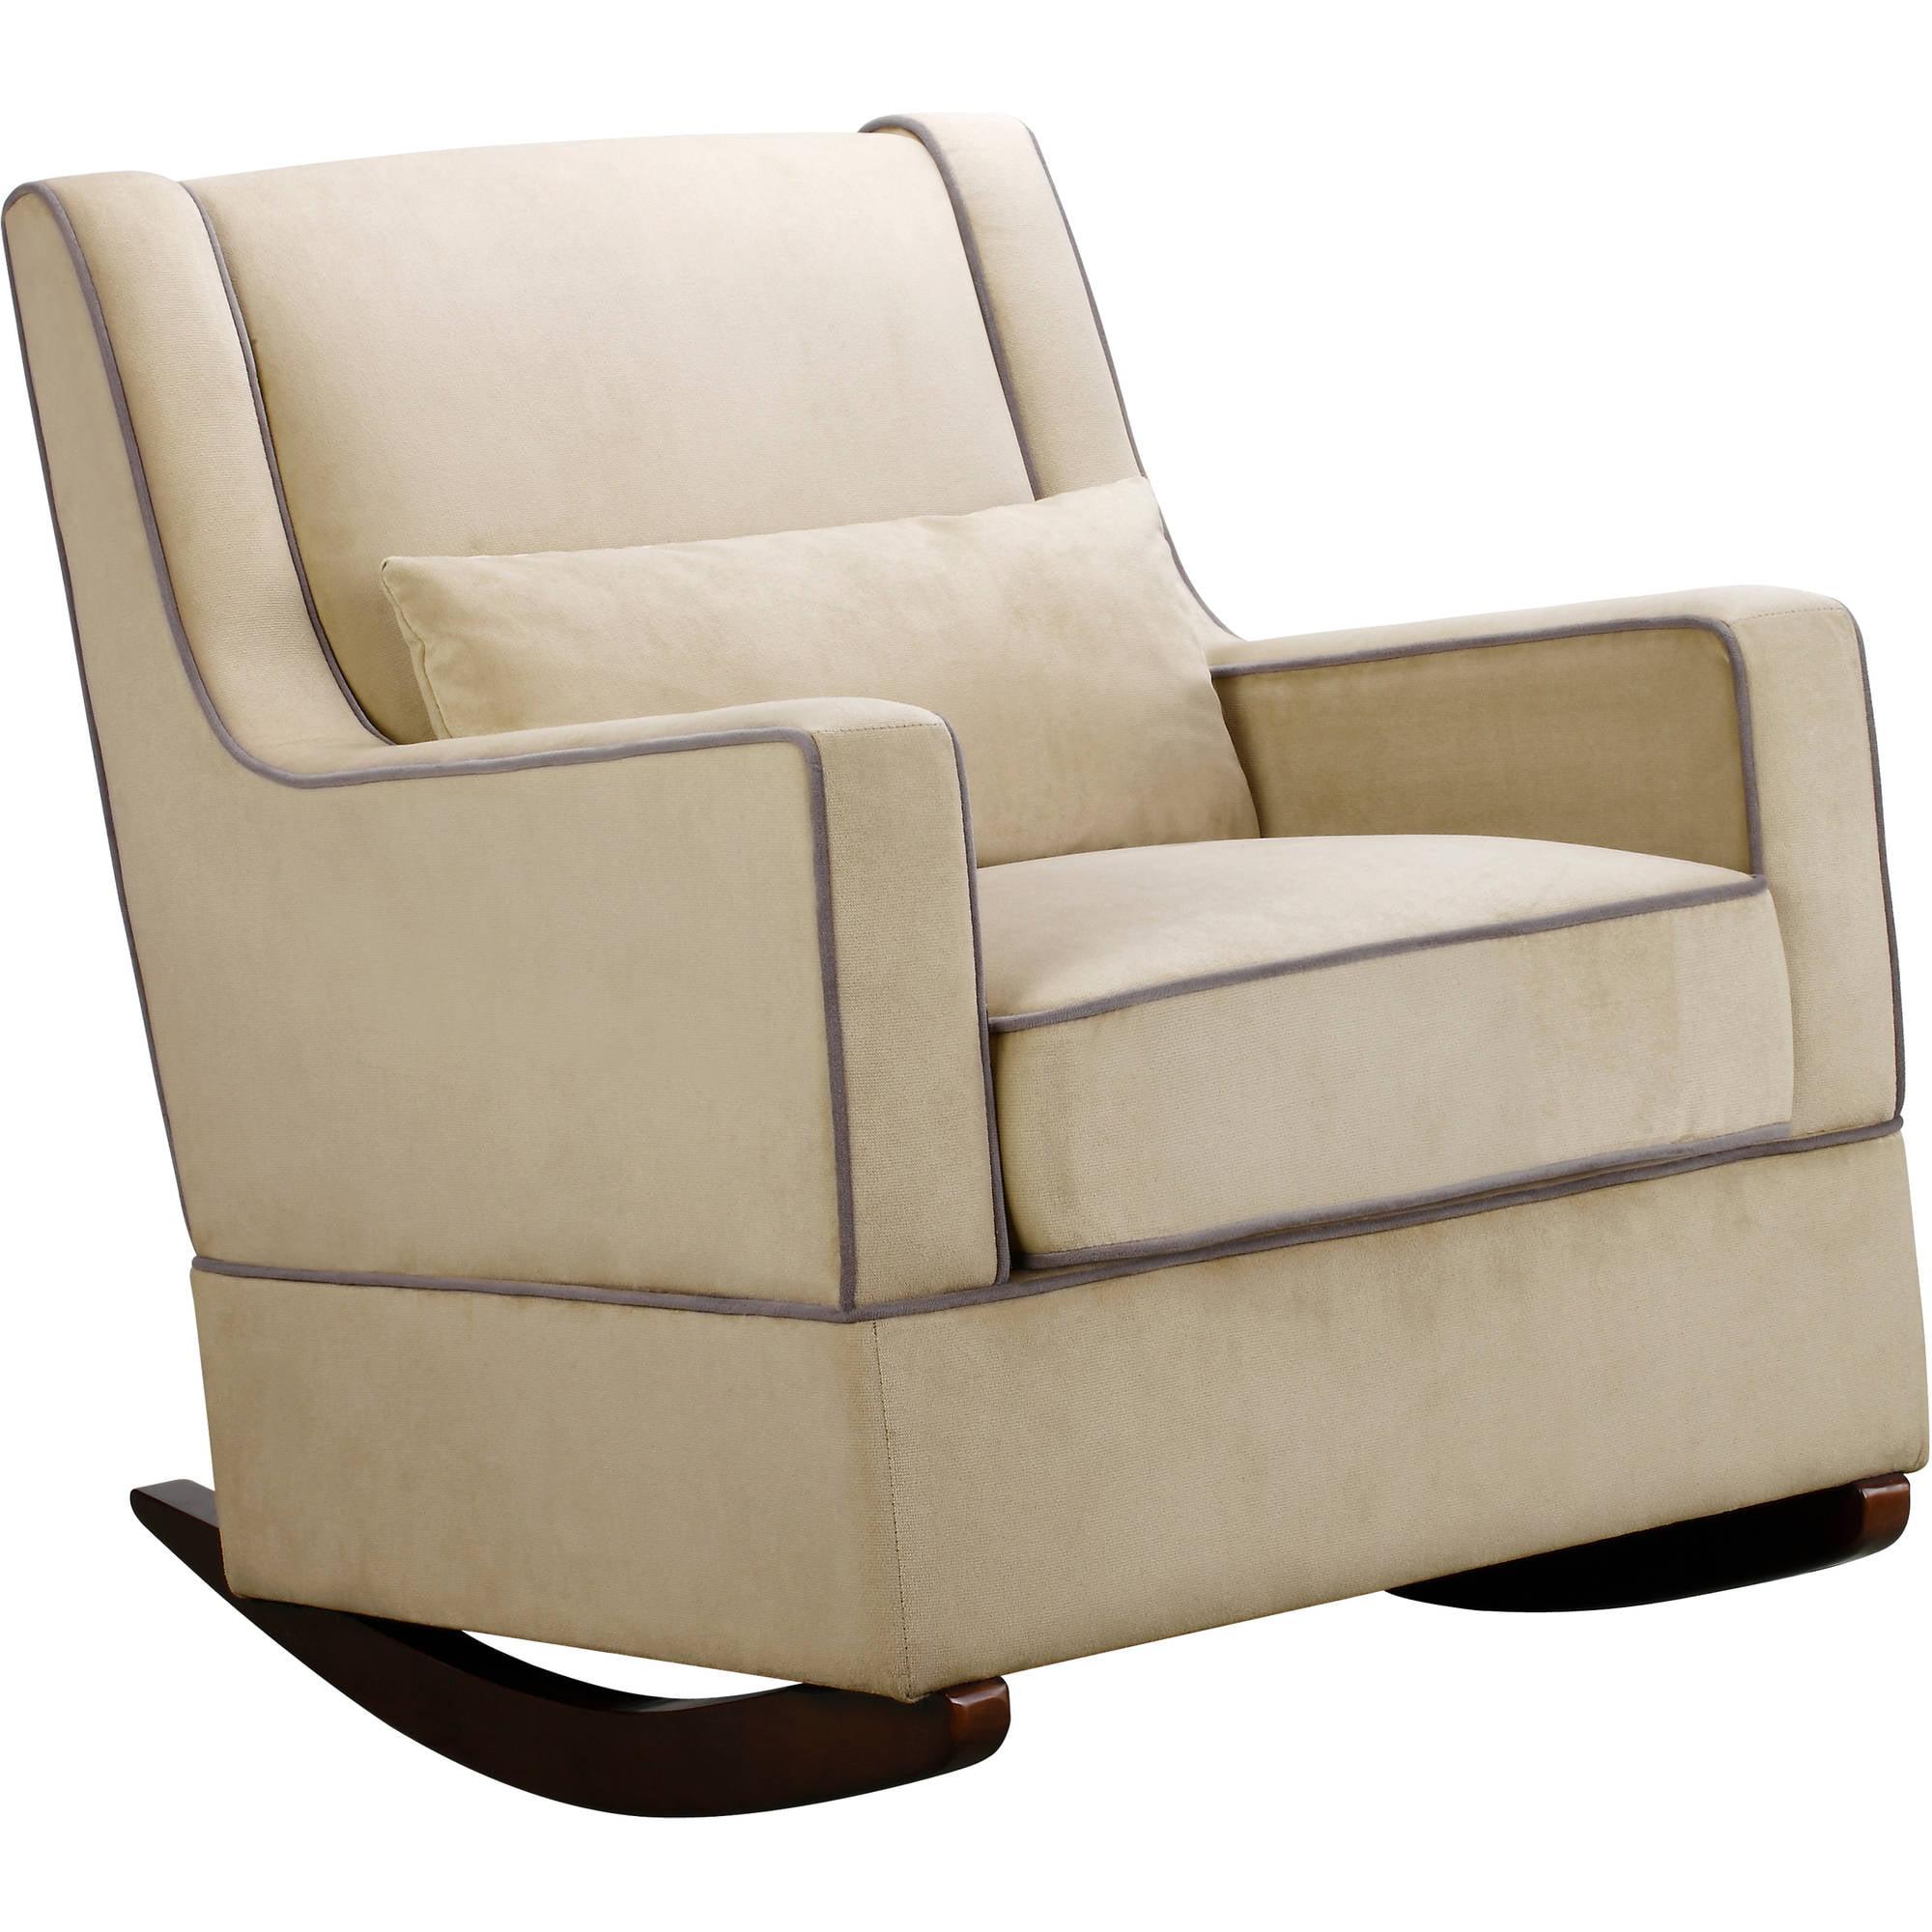 Miraculous Rockers Store Evergreenethics Interior Chair Design Evergreenethicsorg